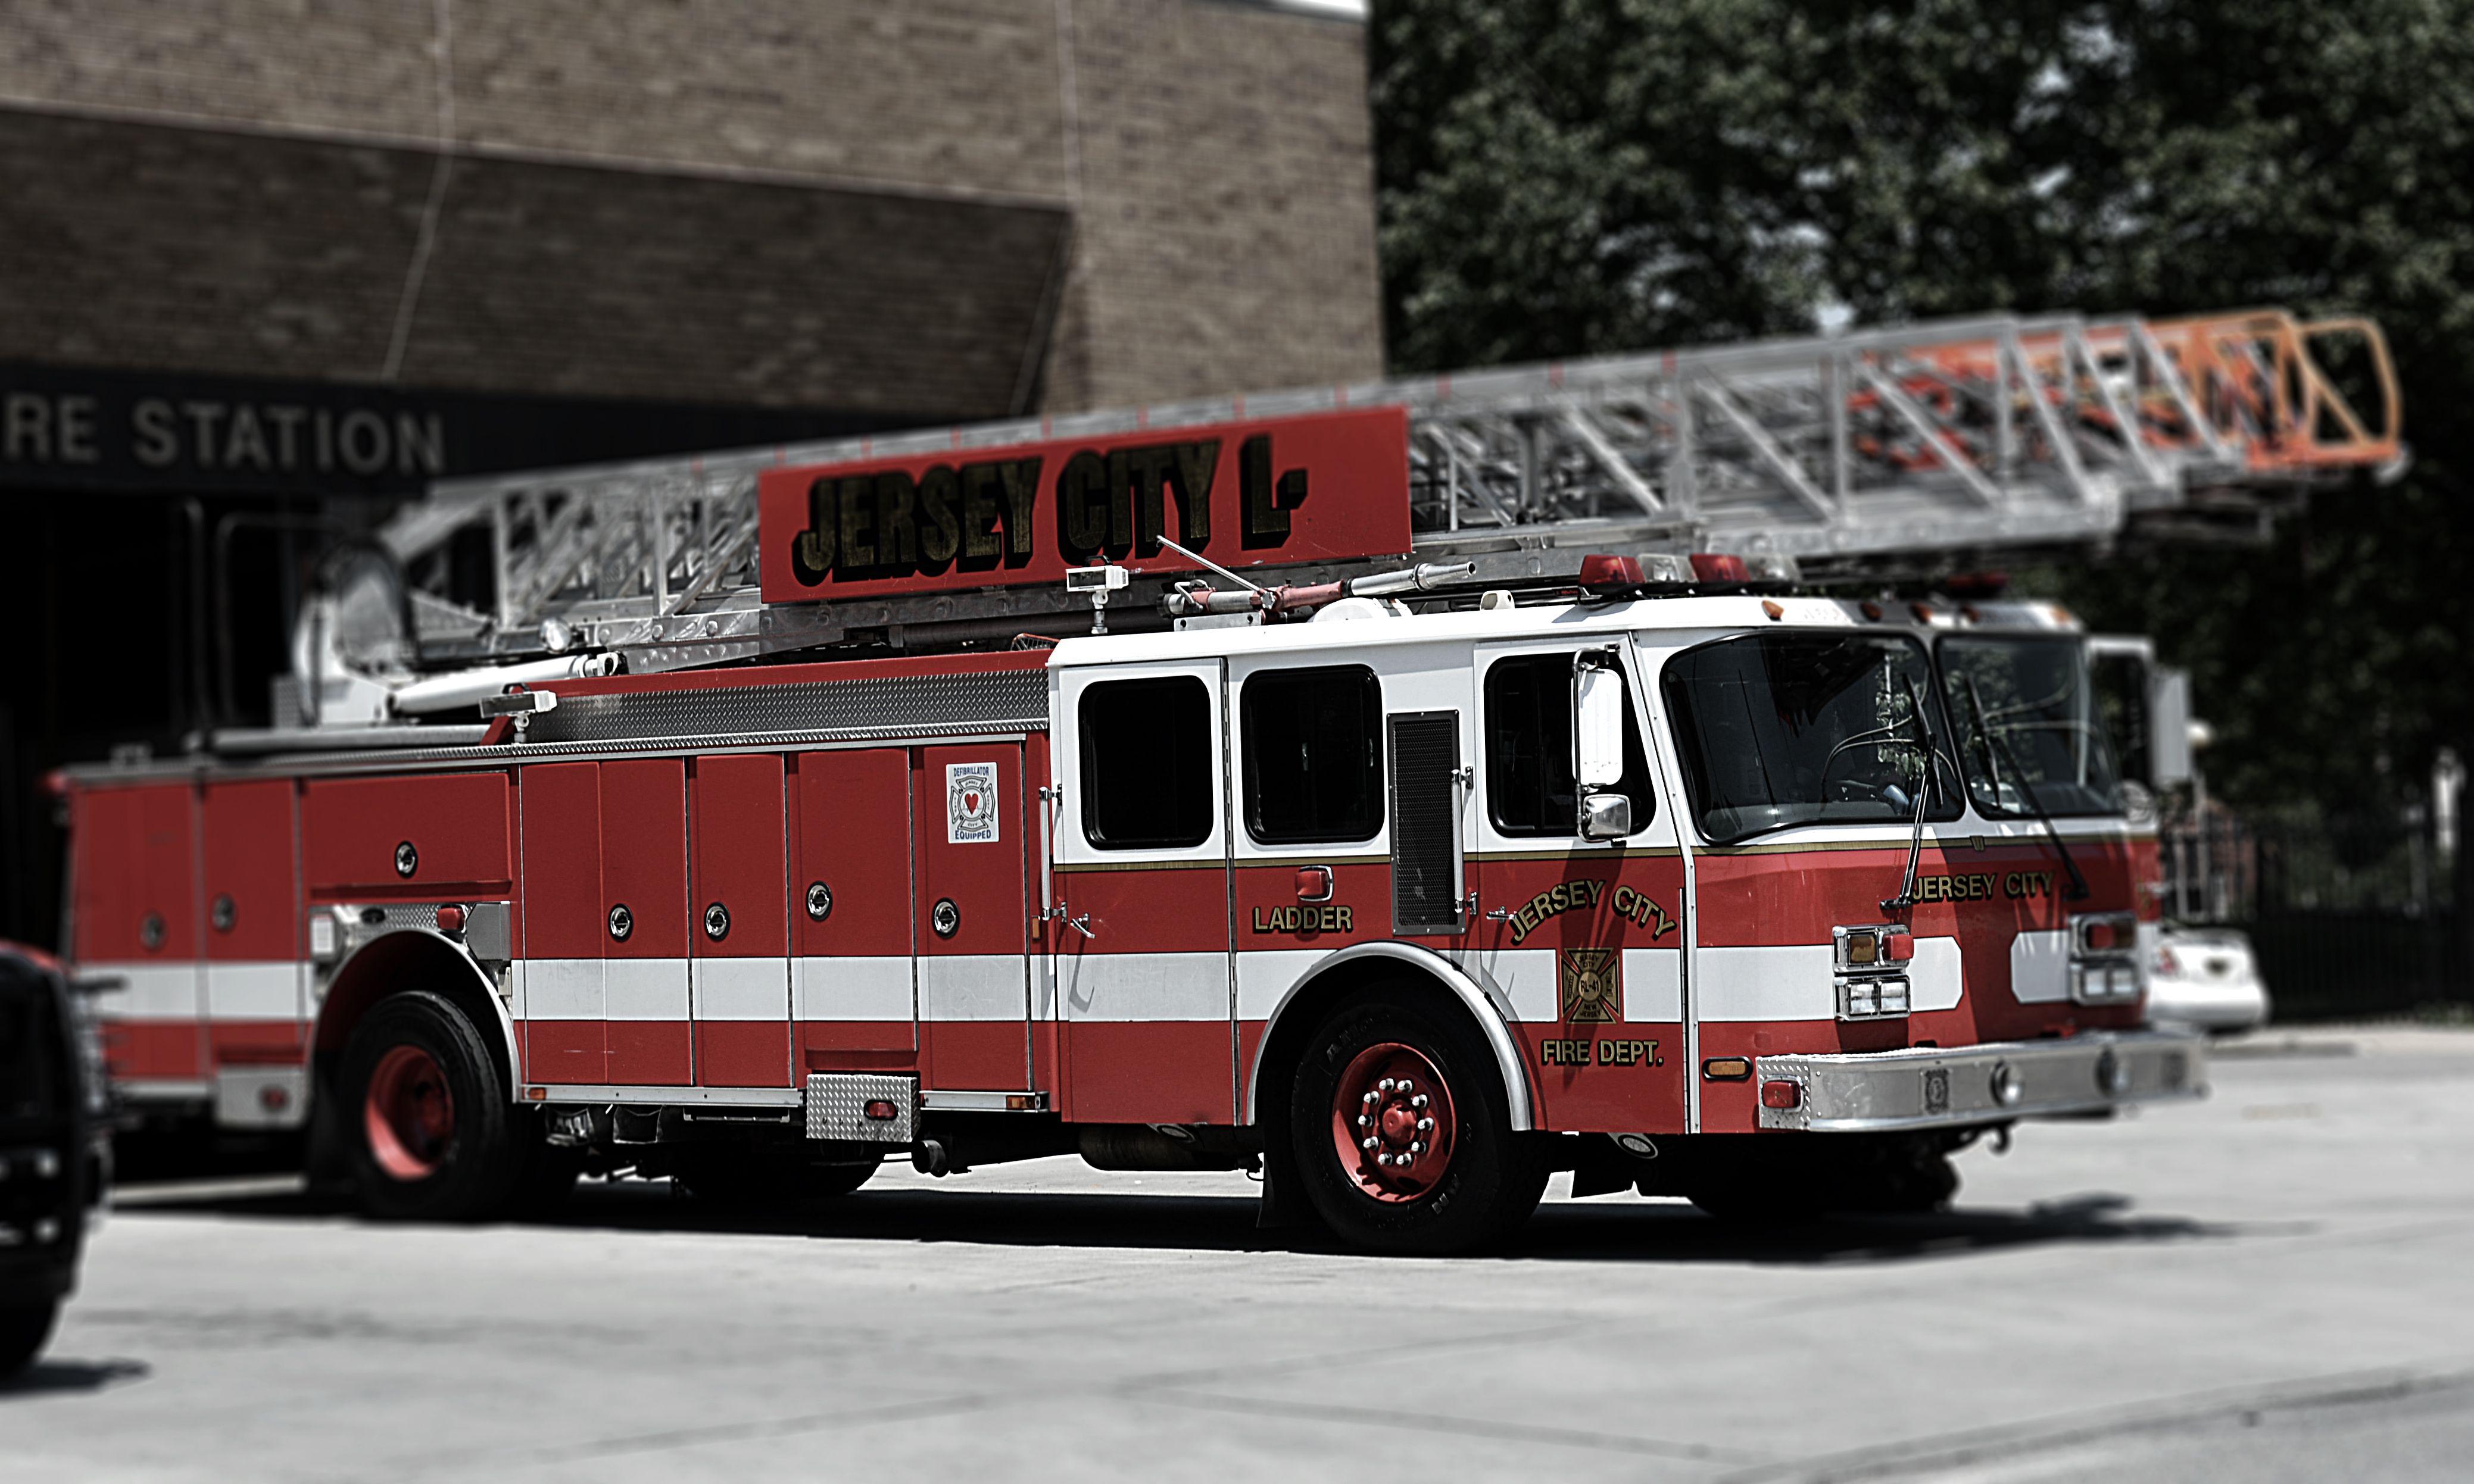 Jersey City Fire Department, NJ 2013